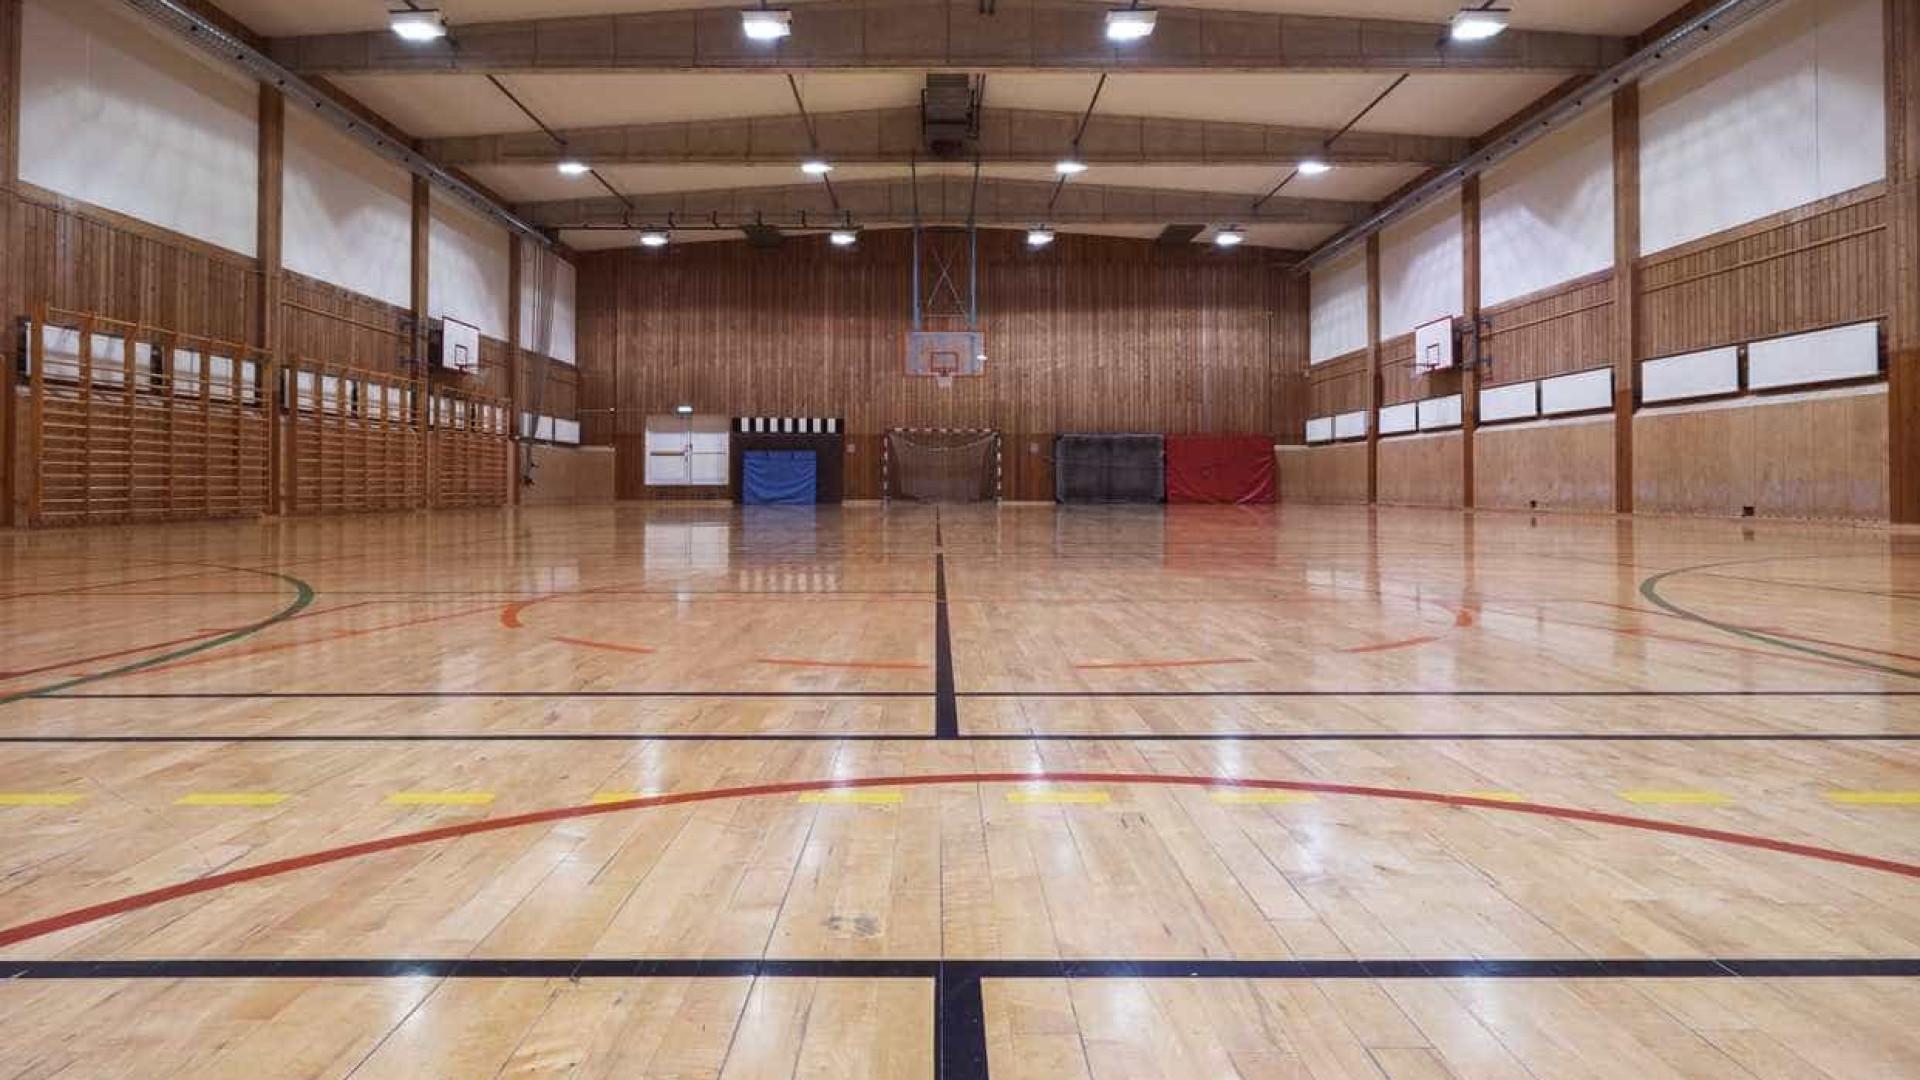 Município de Leiria pretende construir pavilhão desportivo inclusivo